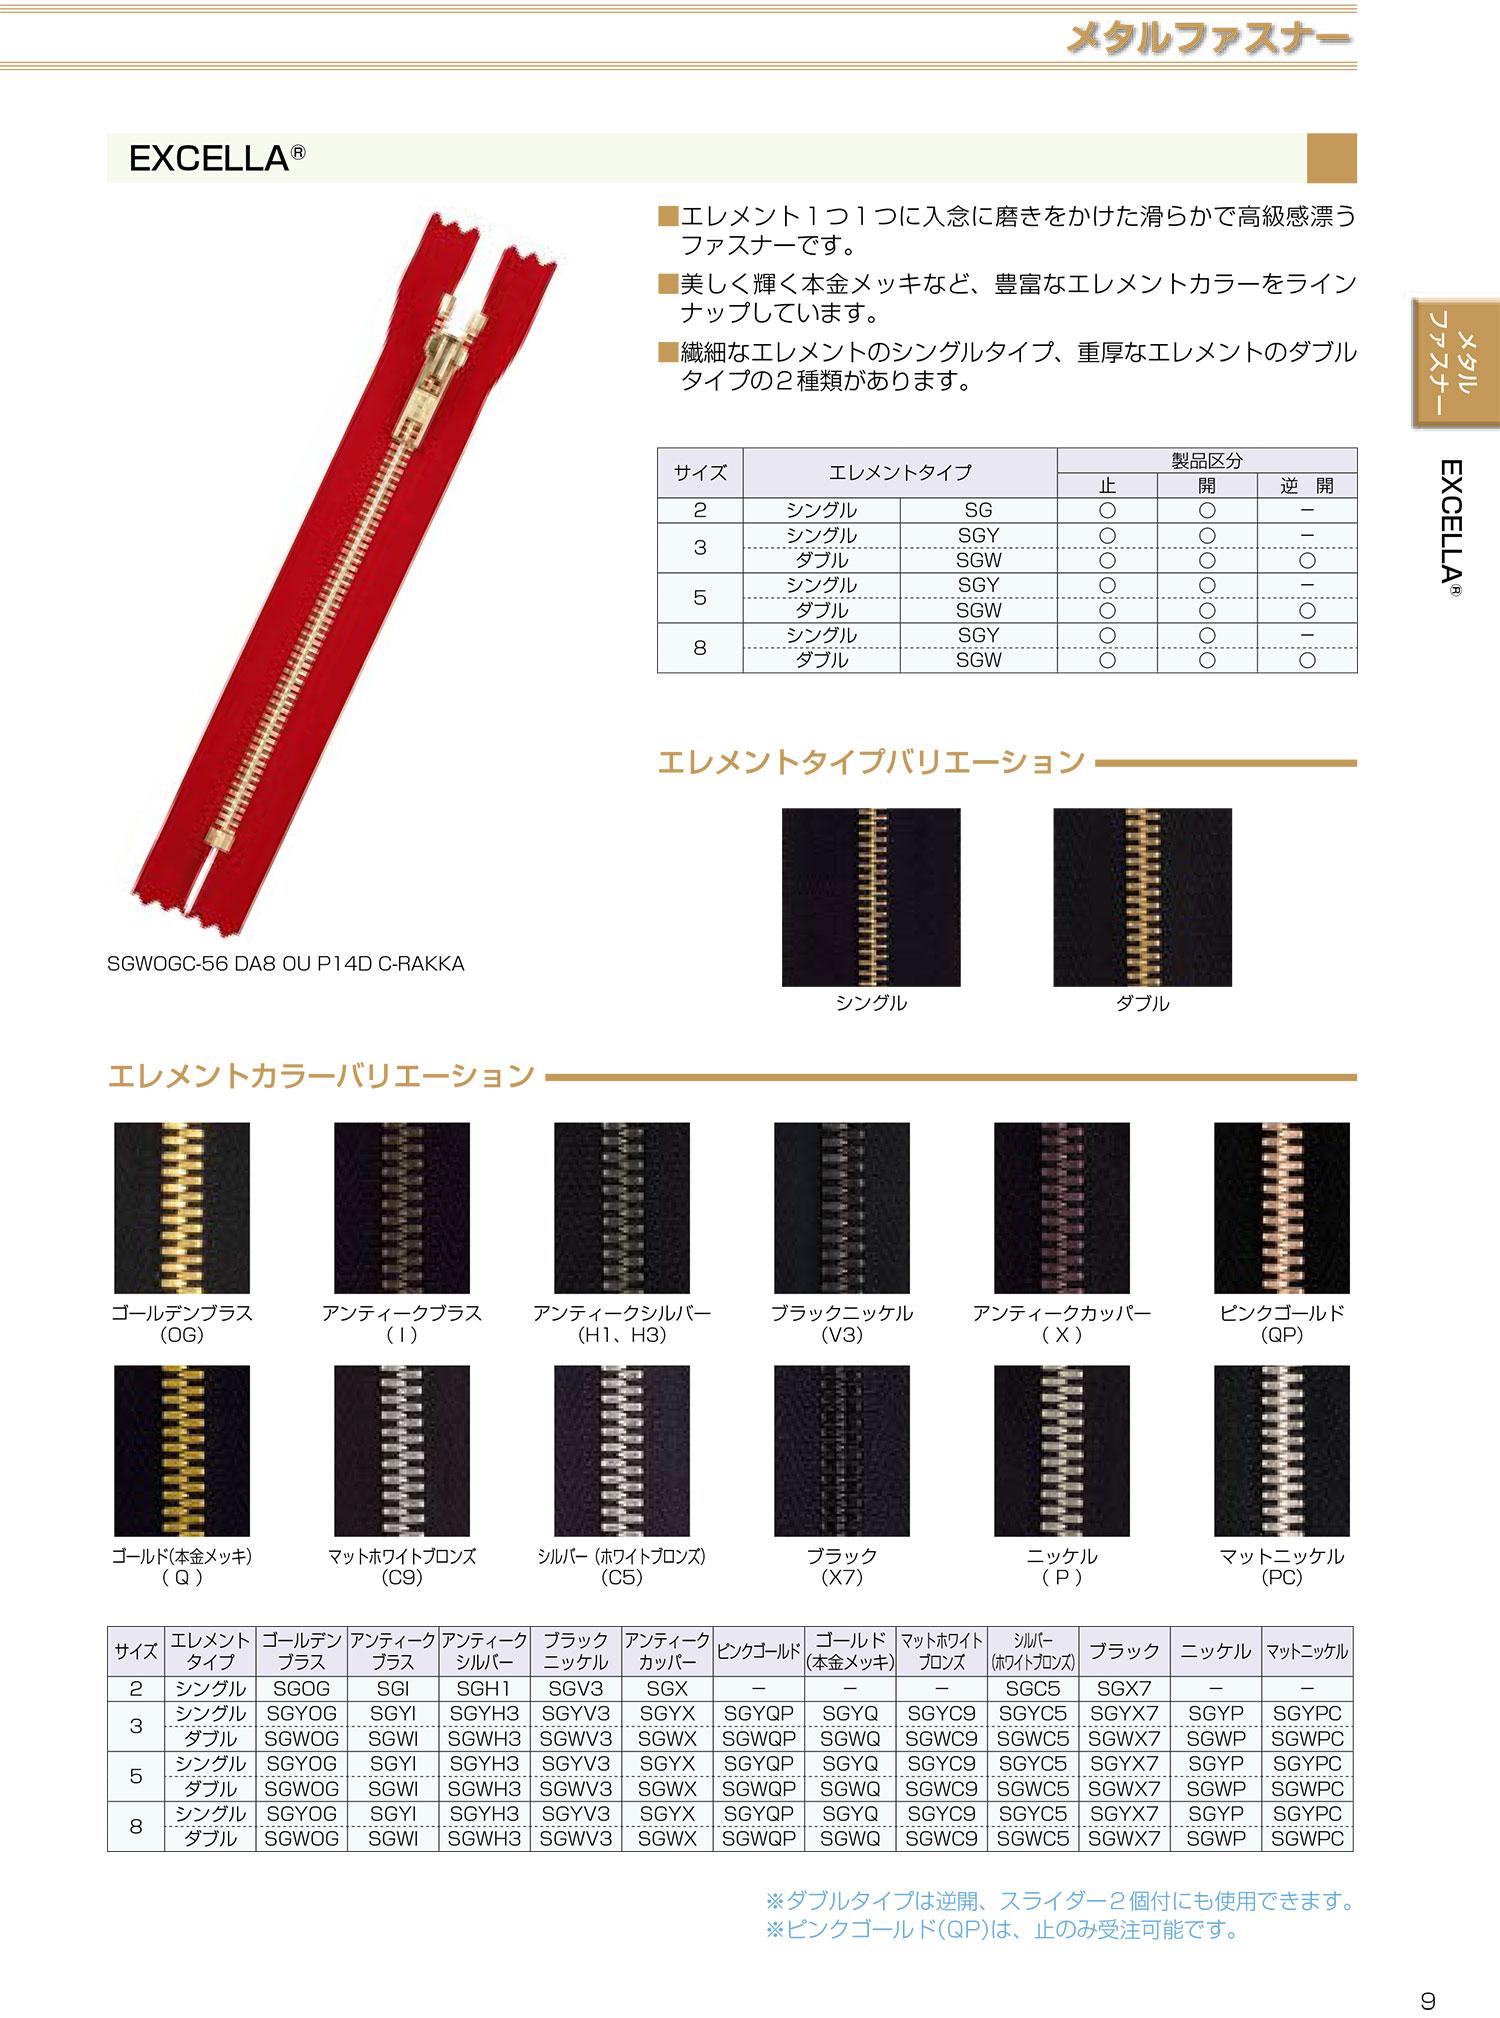 8SGYXOR エクセラ 8サイズ アンティークカッパー オープン シングル[ファスナー] YKK/オークラ商事 - ApparelX アパレル資材卸通販